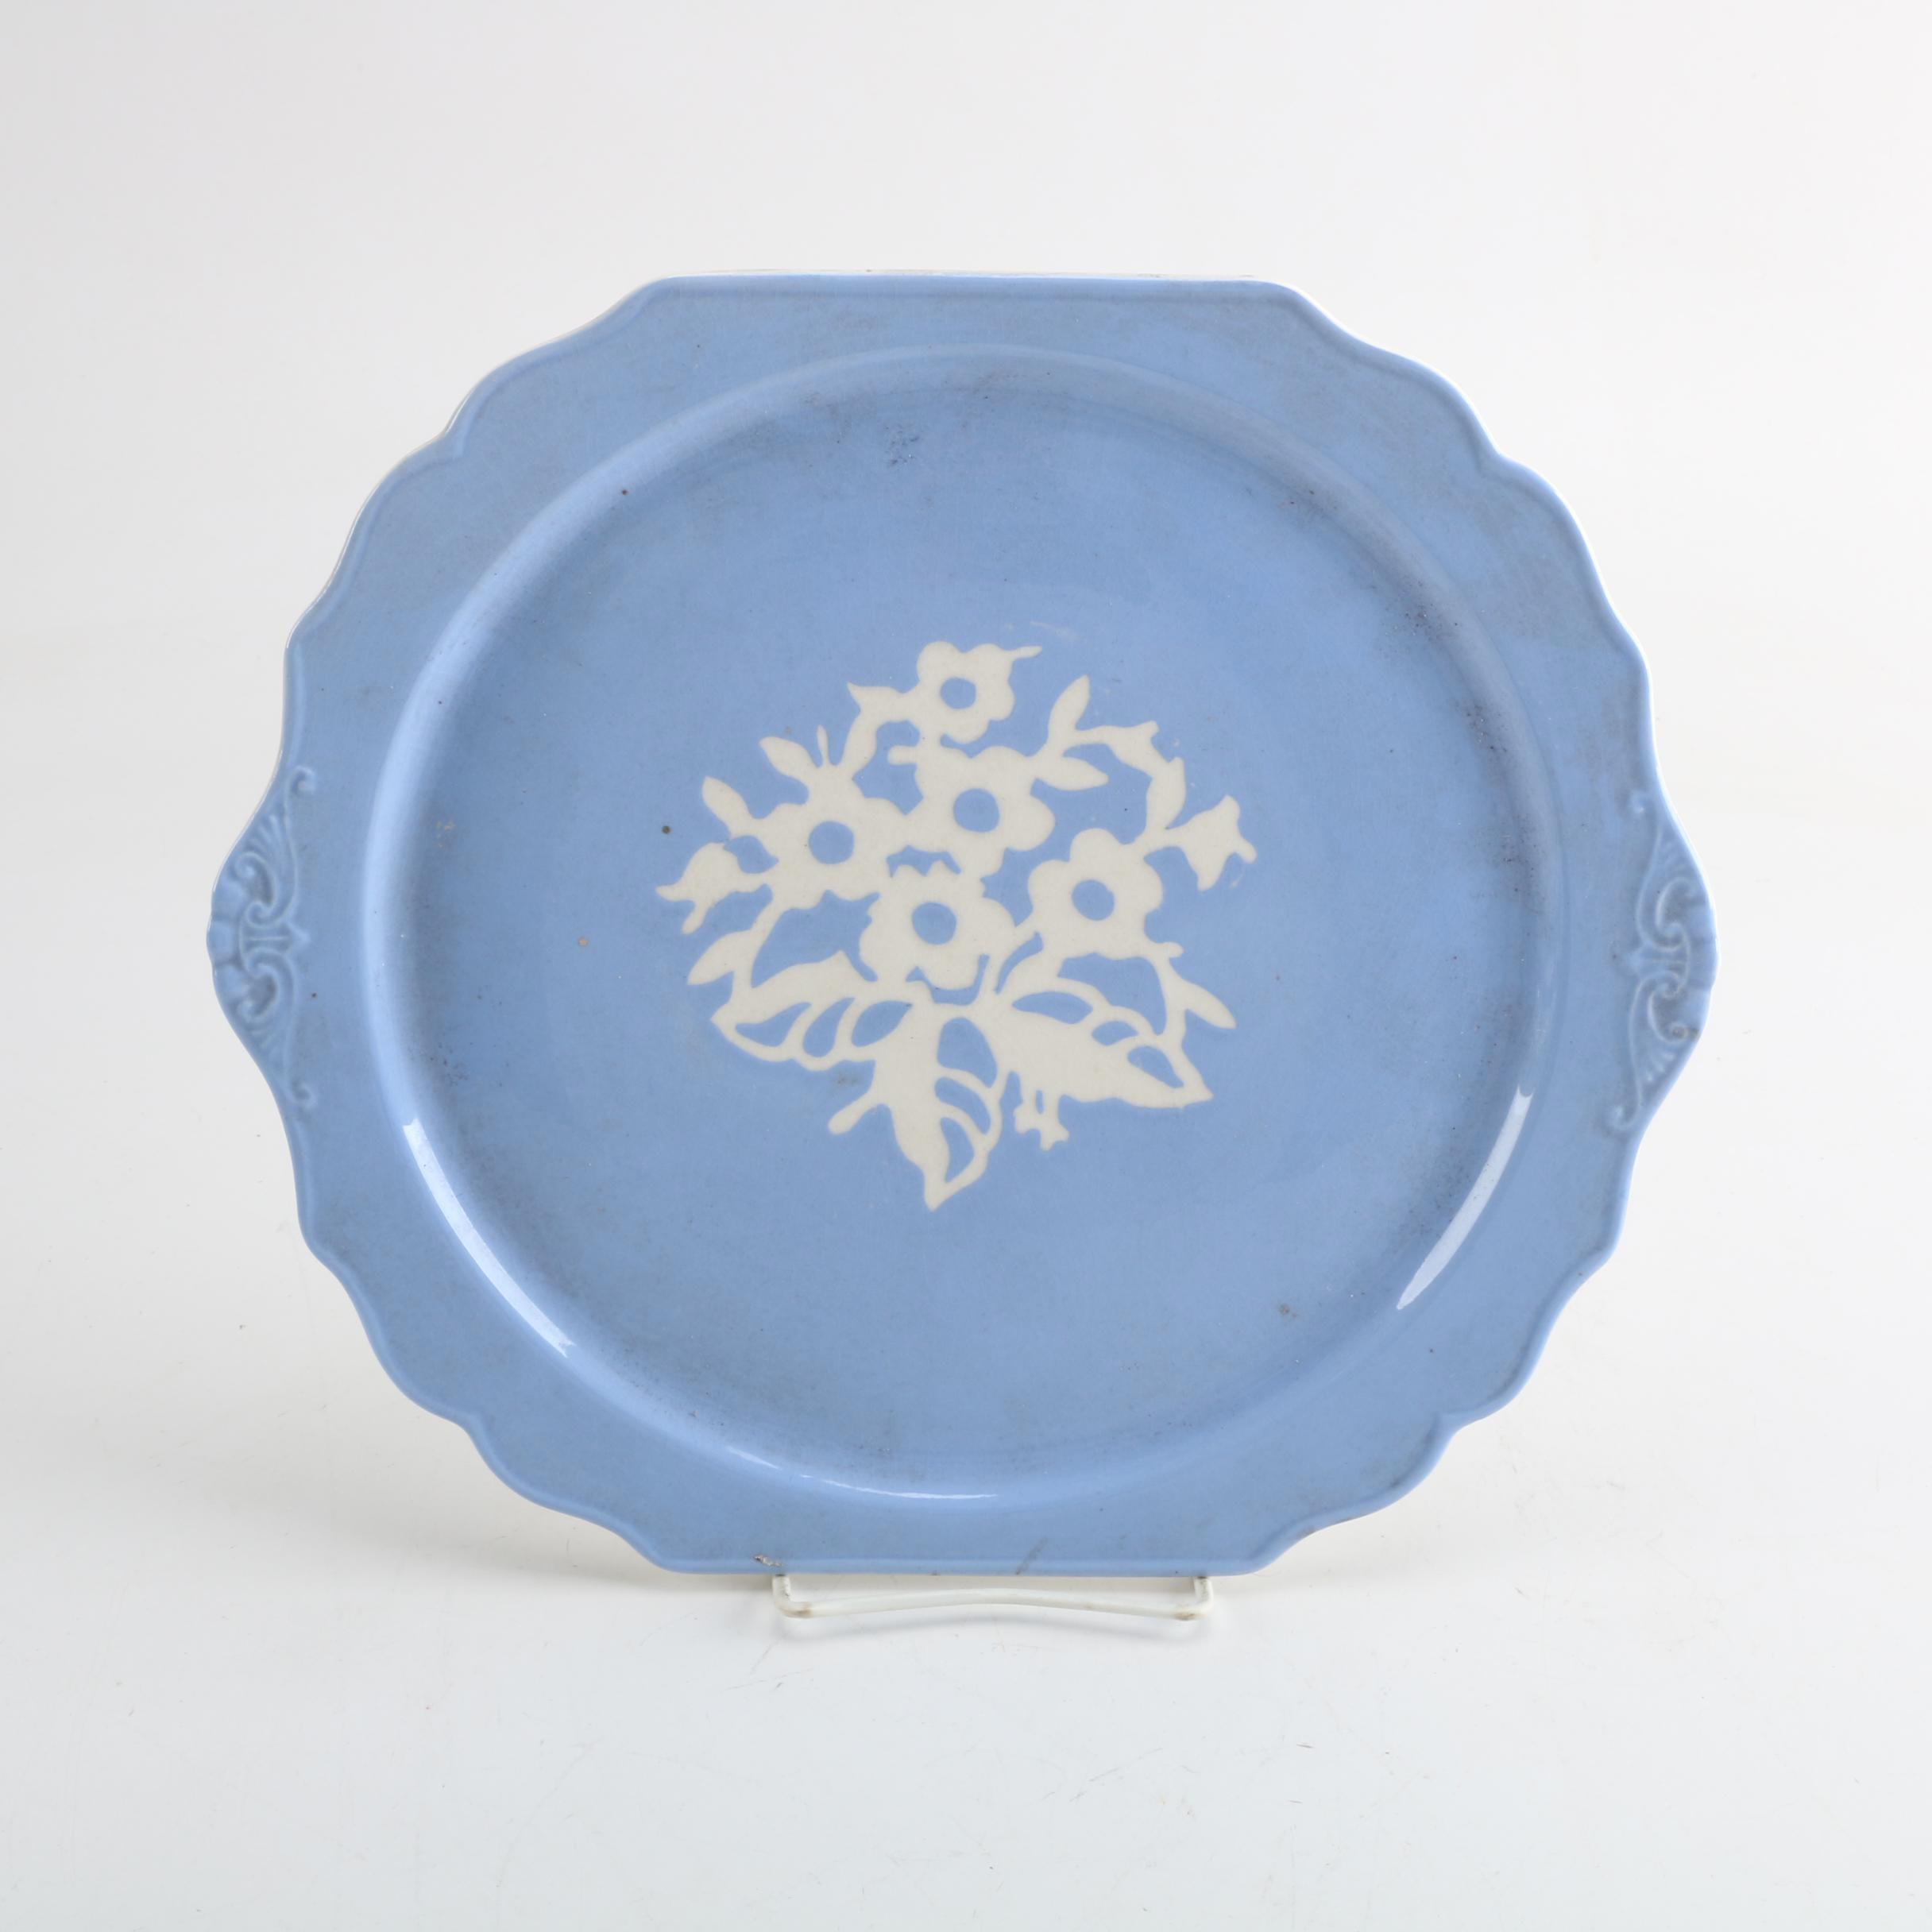 Vintage Harker Pottery Cameo Ware Serving Plate